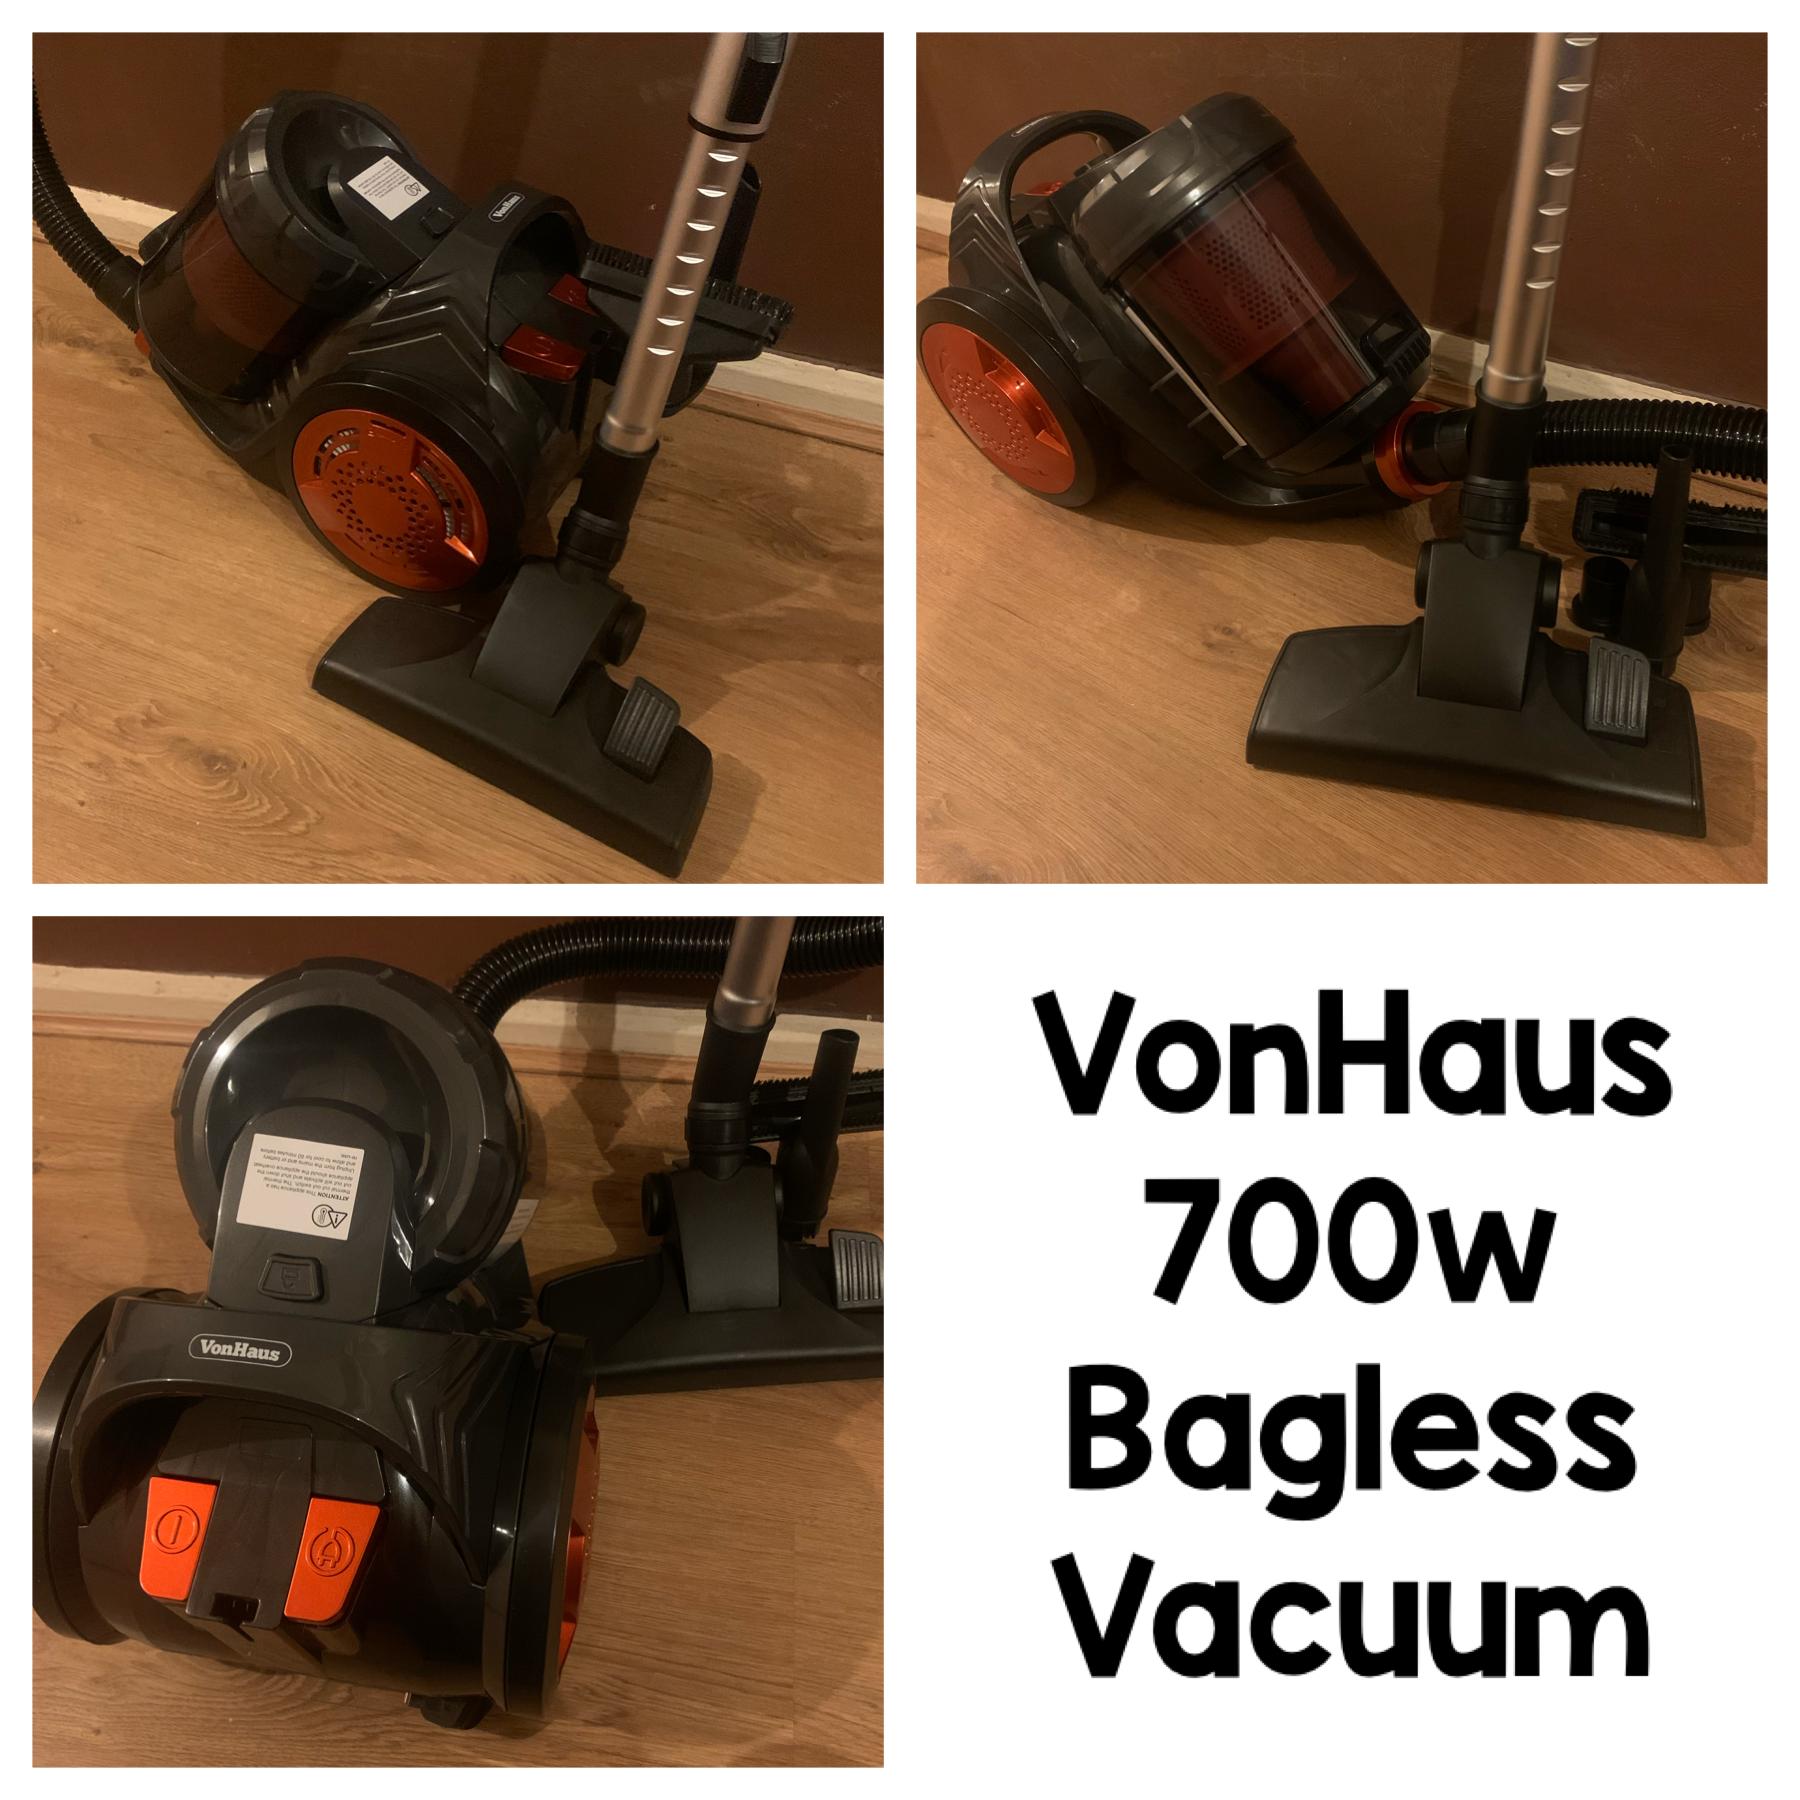 VonHaus 700W Bagless Vacuum